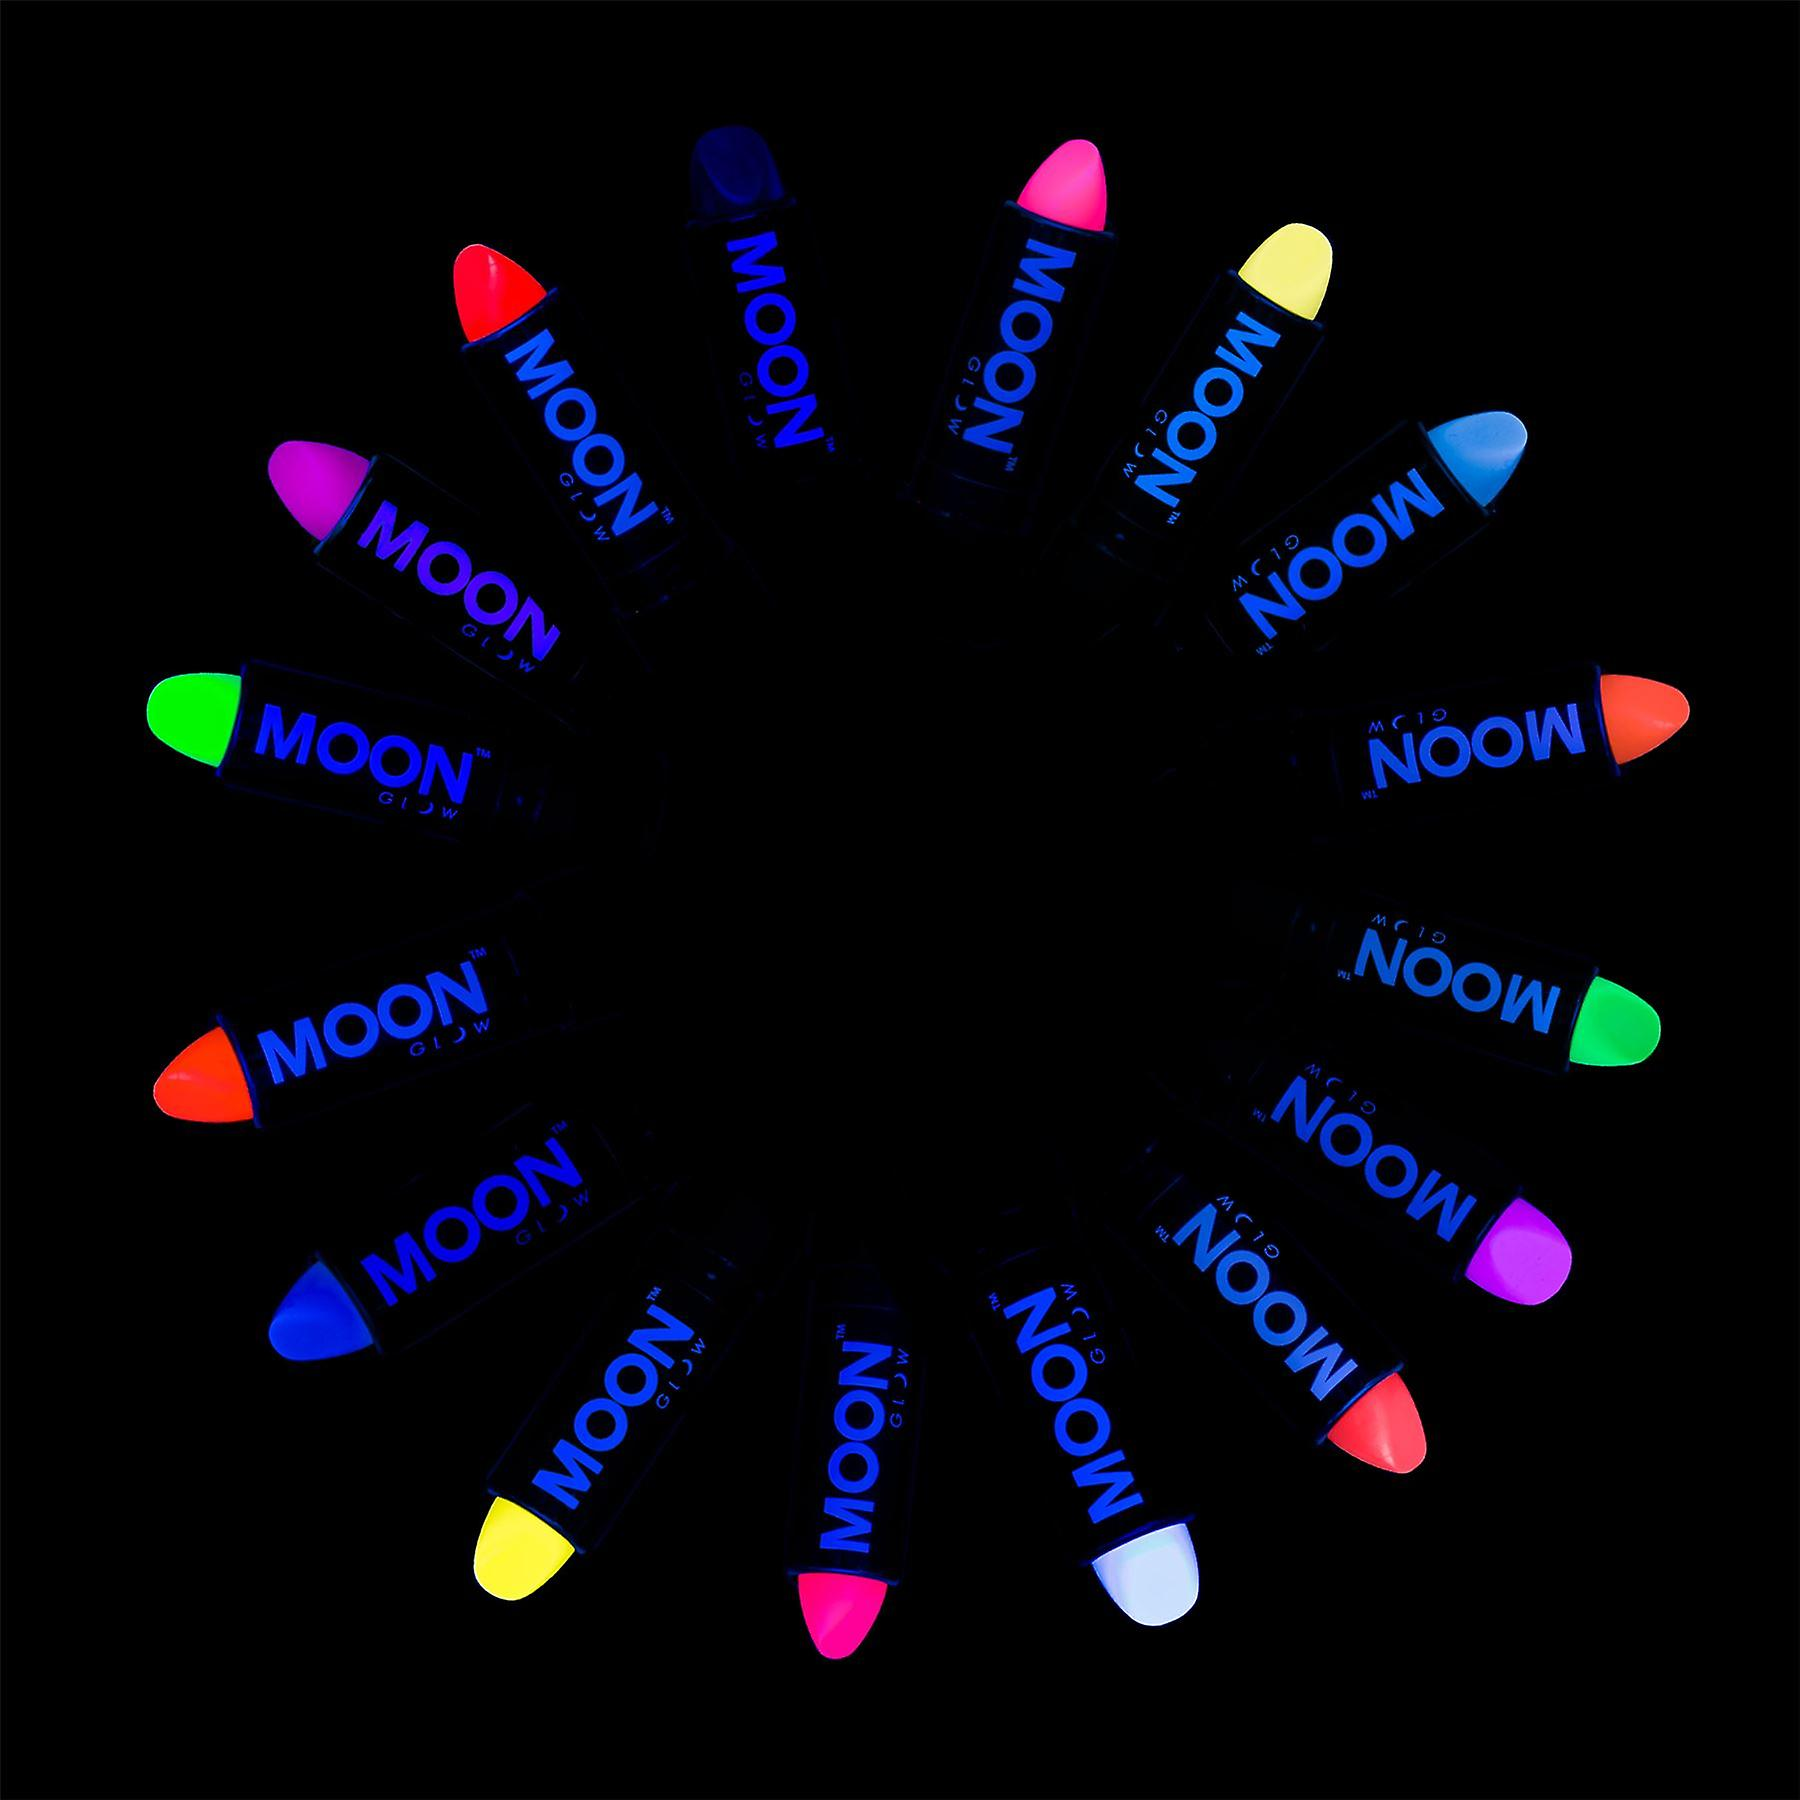 Moon Glow - 4.5g UV Lipstick - Intense Set of 16